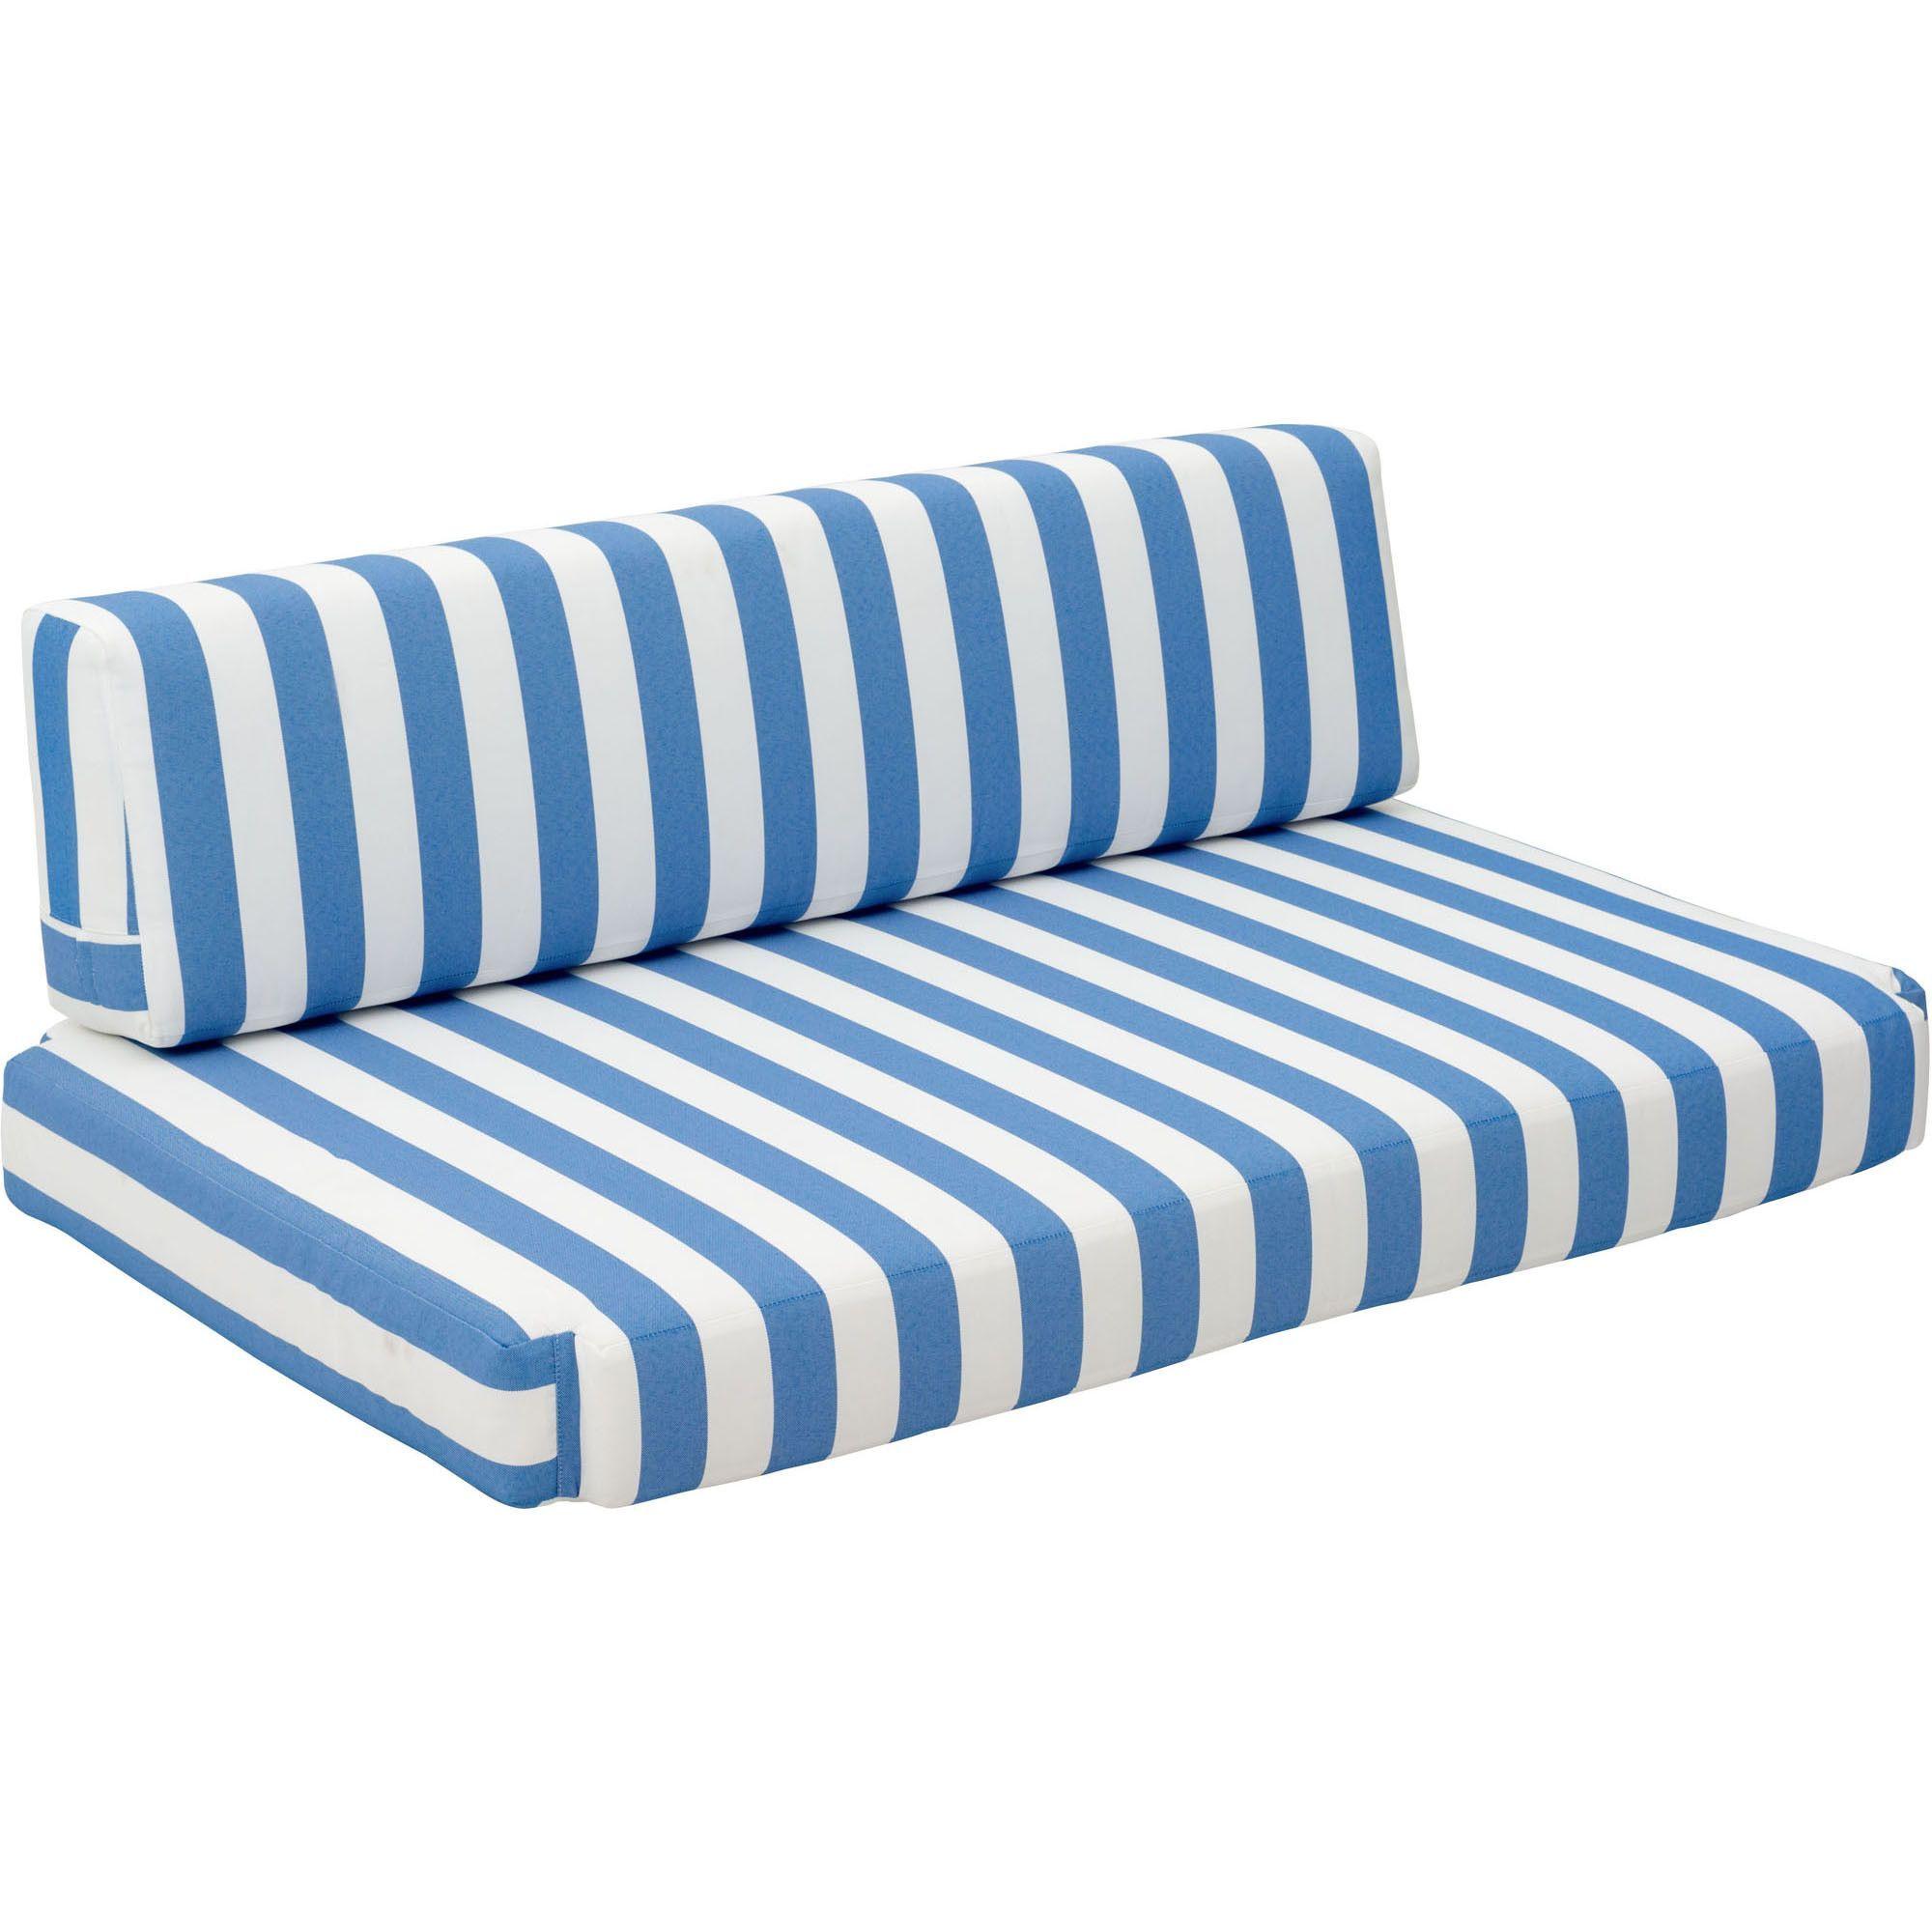 Bilander Outdoor Sofa Cushion Blue U0026 White